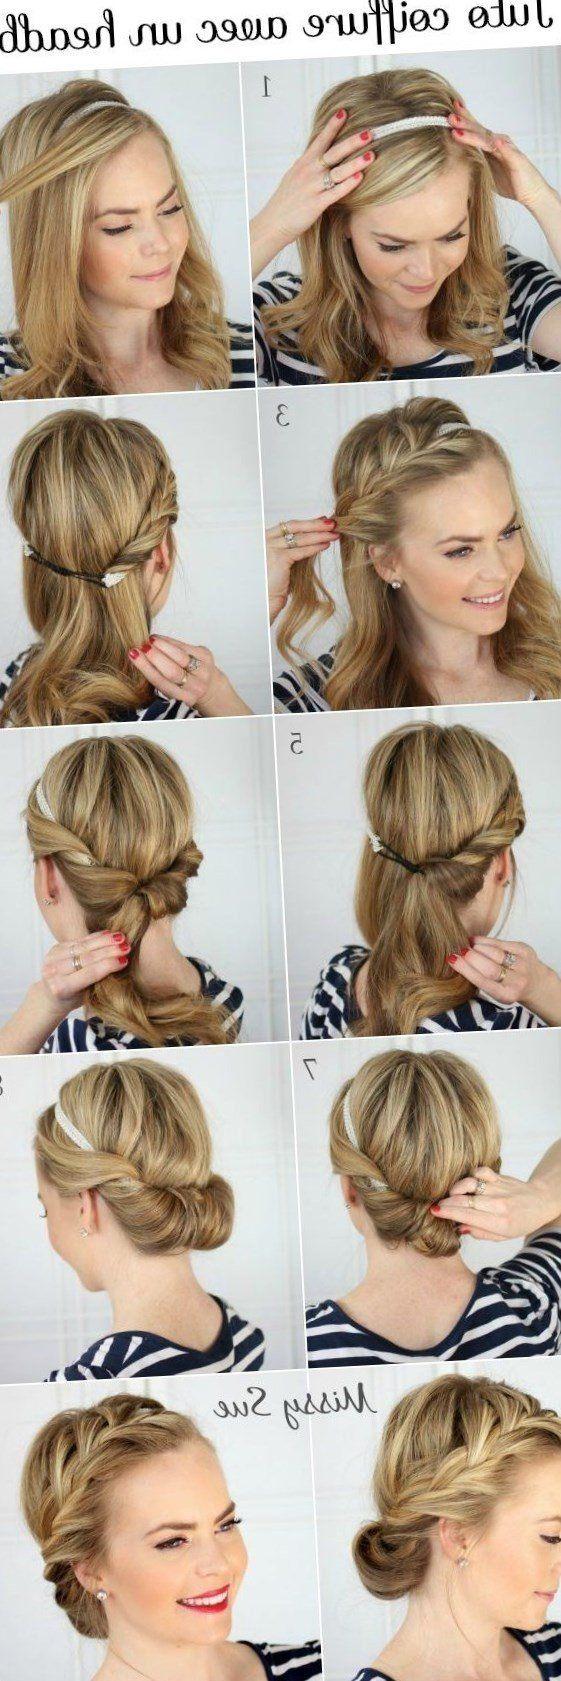 Coiffure De Mariage Frange Headband Et Ondulations Coiffure Facile Coiffure Cheveux Mi Long Coiffures Simples